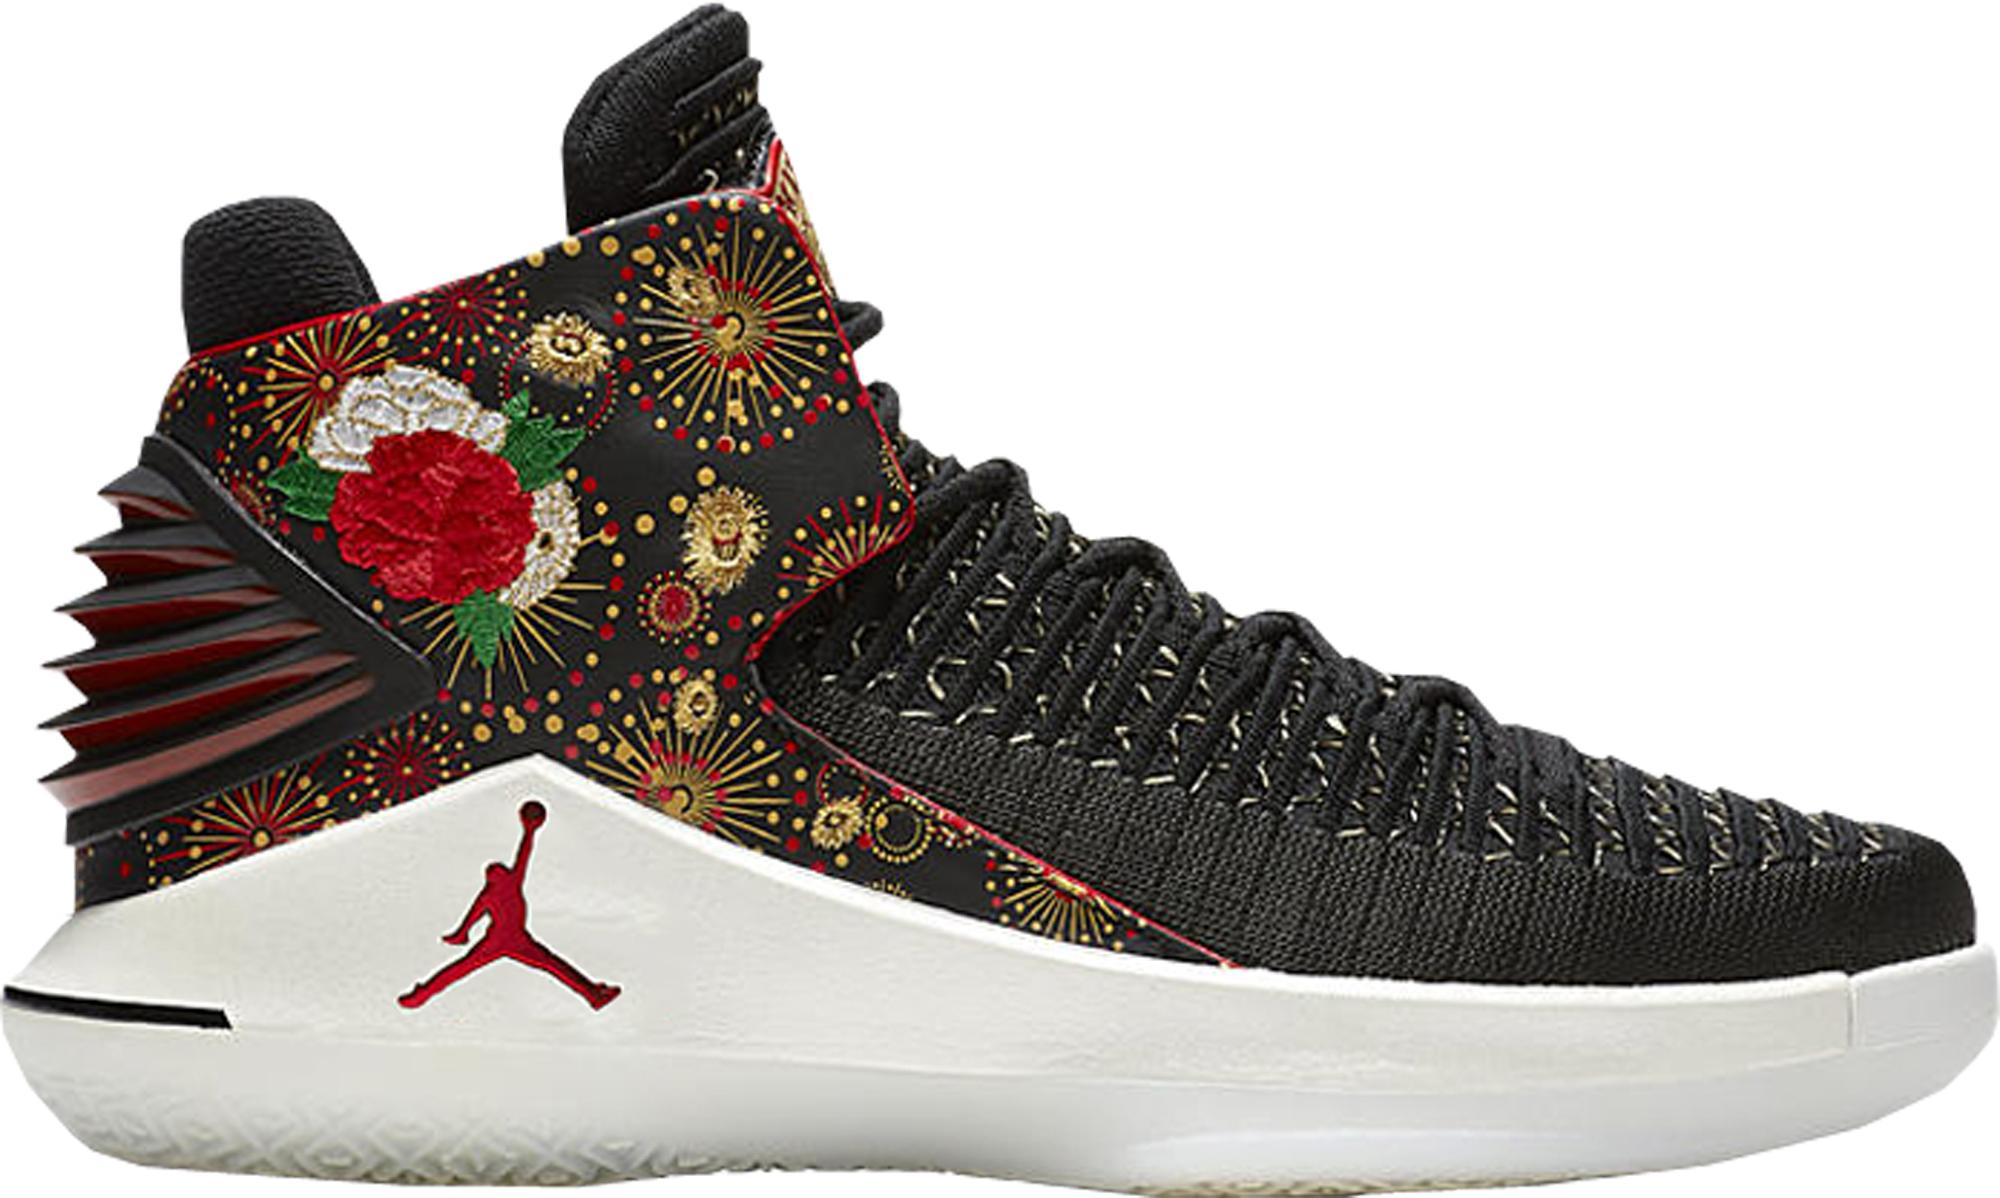 Jordan XXXII Chinese New Year 2018 (China Release)